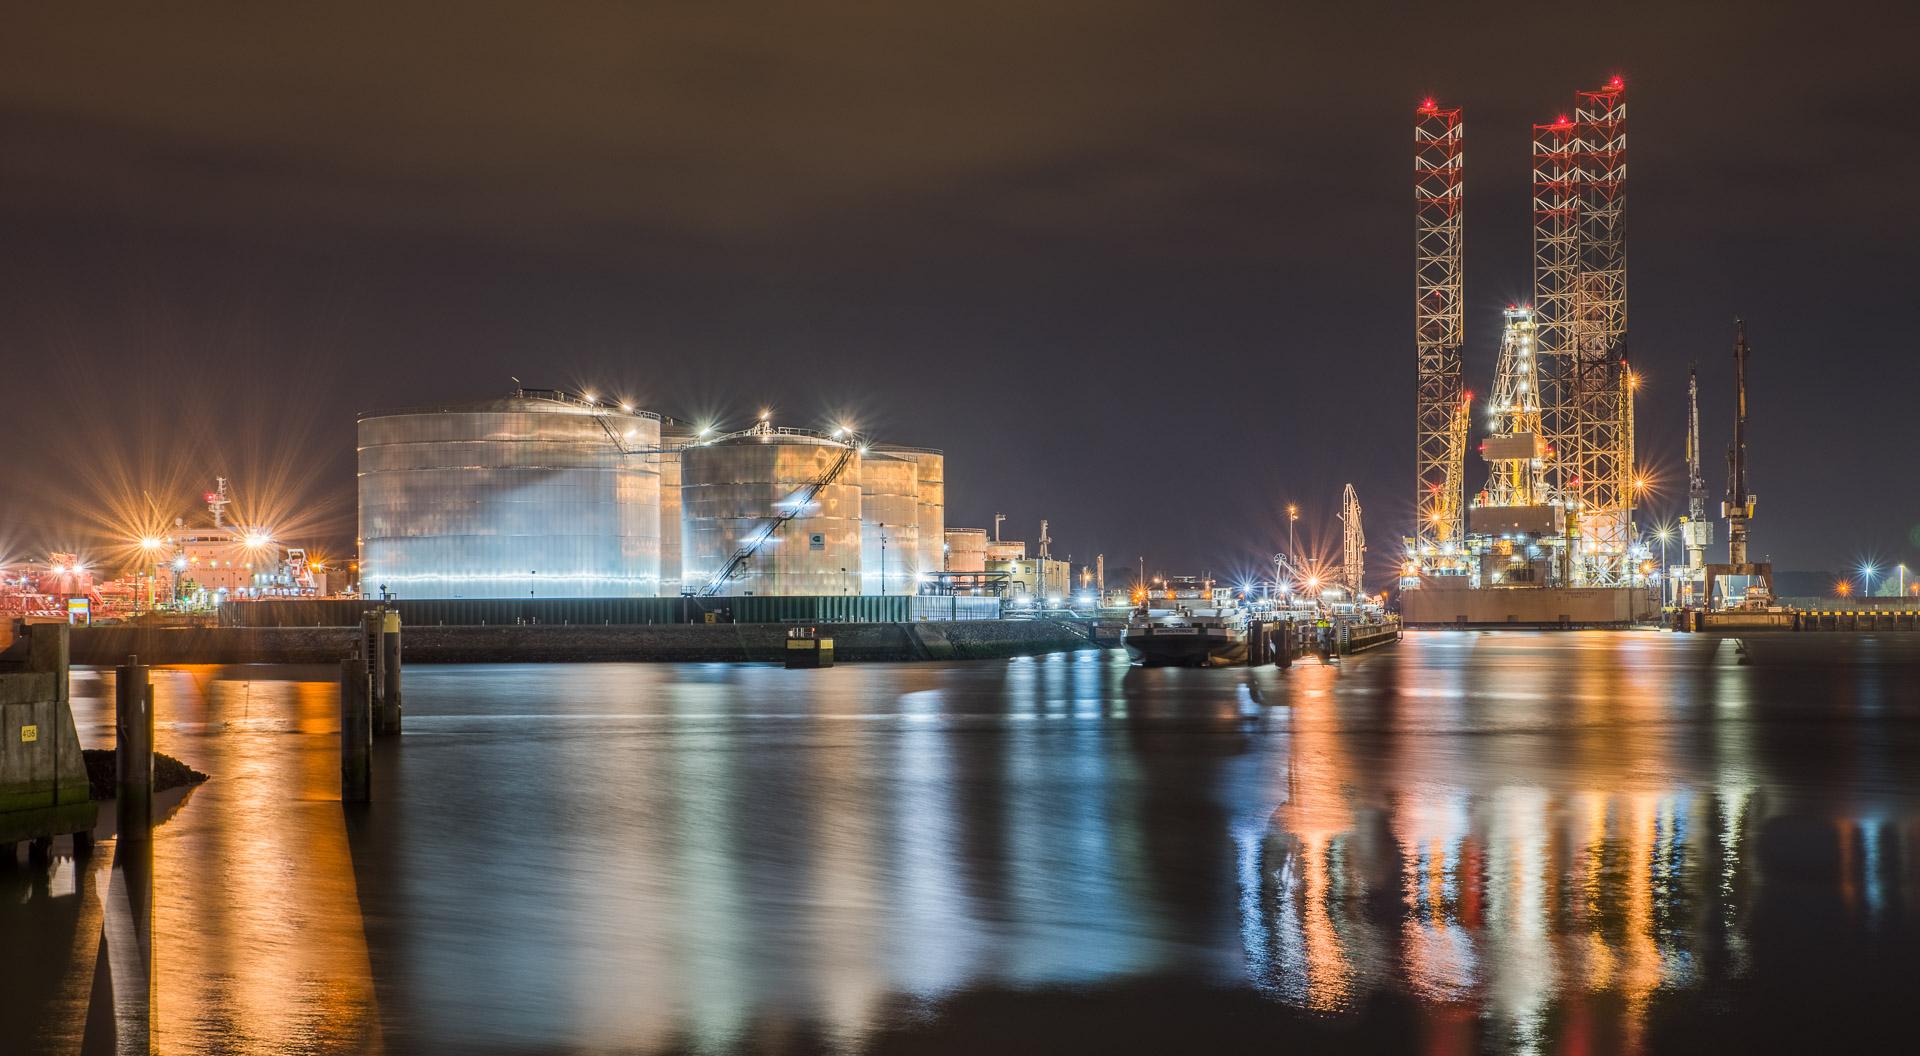 harbor-by-night-slider